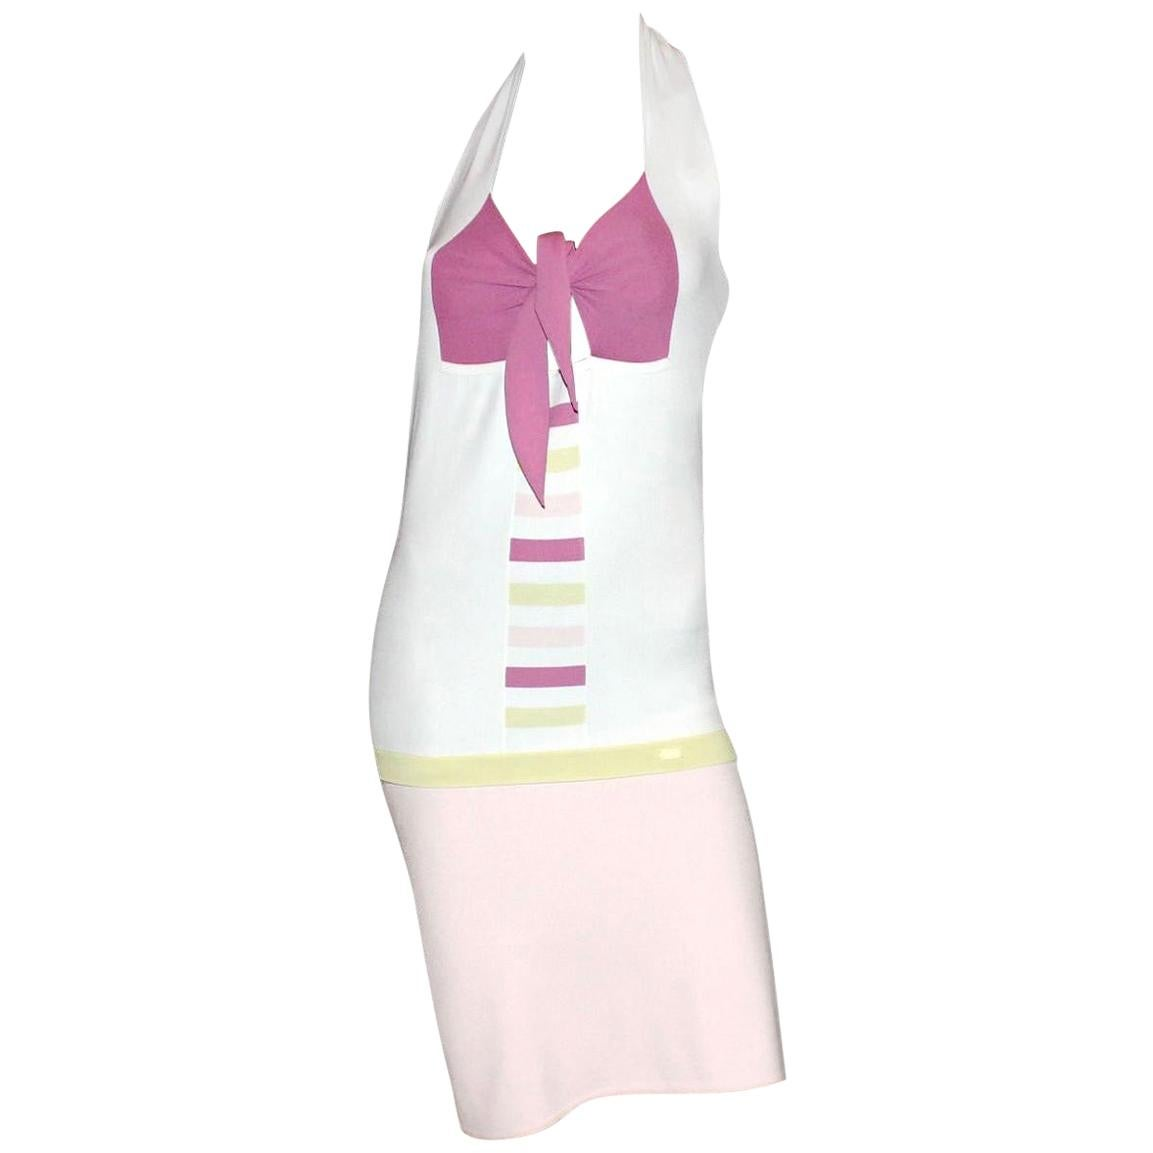 UNWORN Chanel Candyland Neckholder Bow Detail 2PCS Top Skirt Ensemble Like Dress